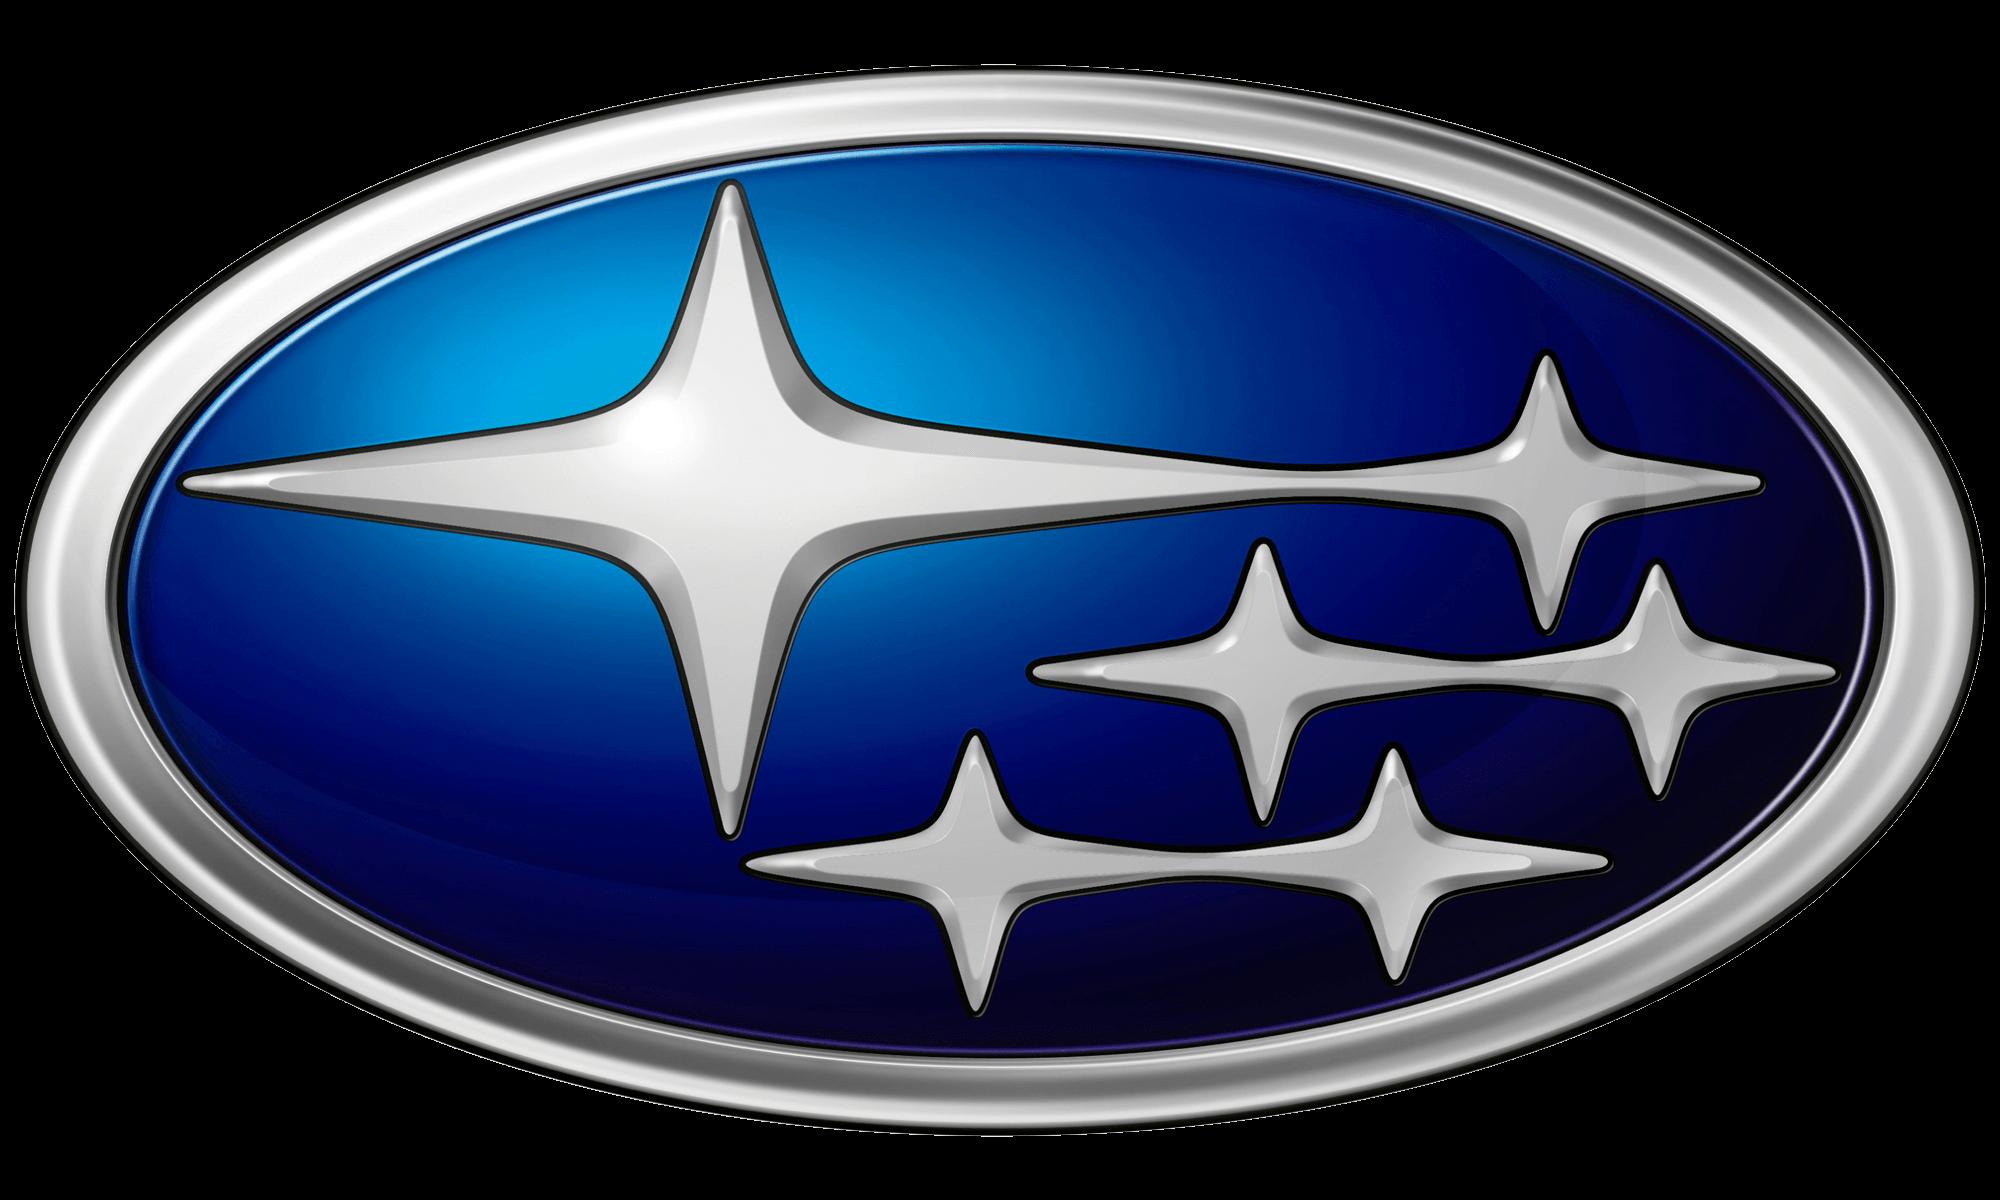 subaru logo transparent png stickpng rh stickpng com subaru logo pleiades subaru logo png